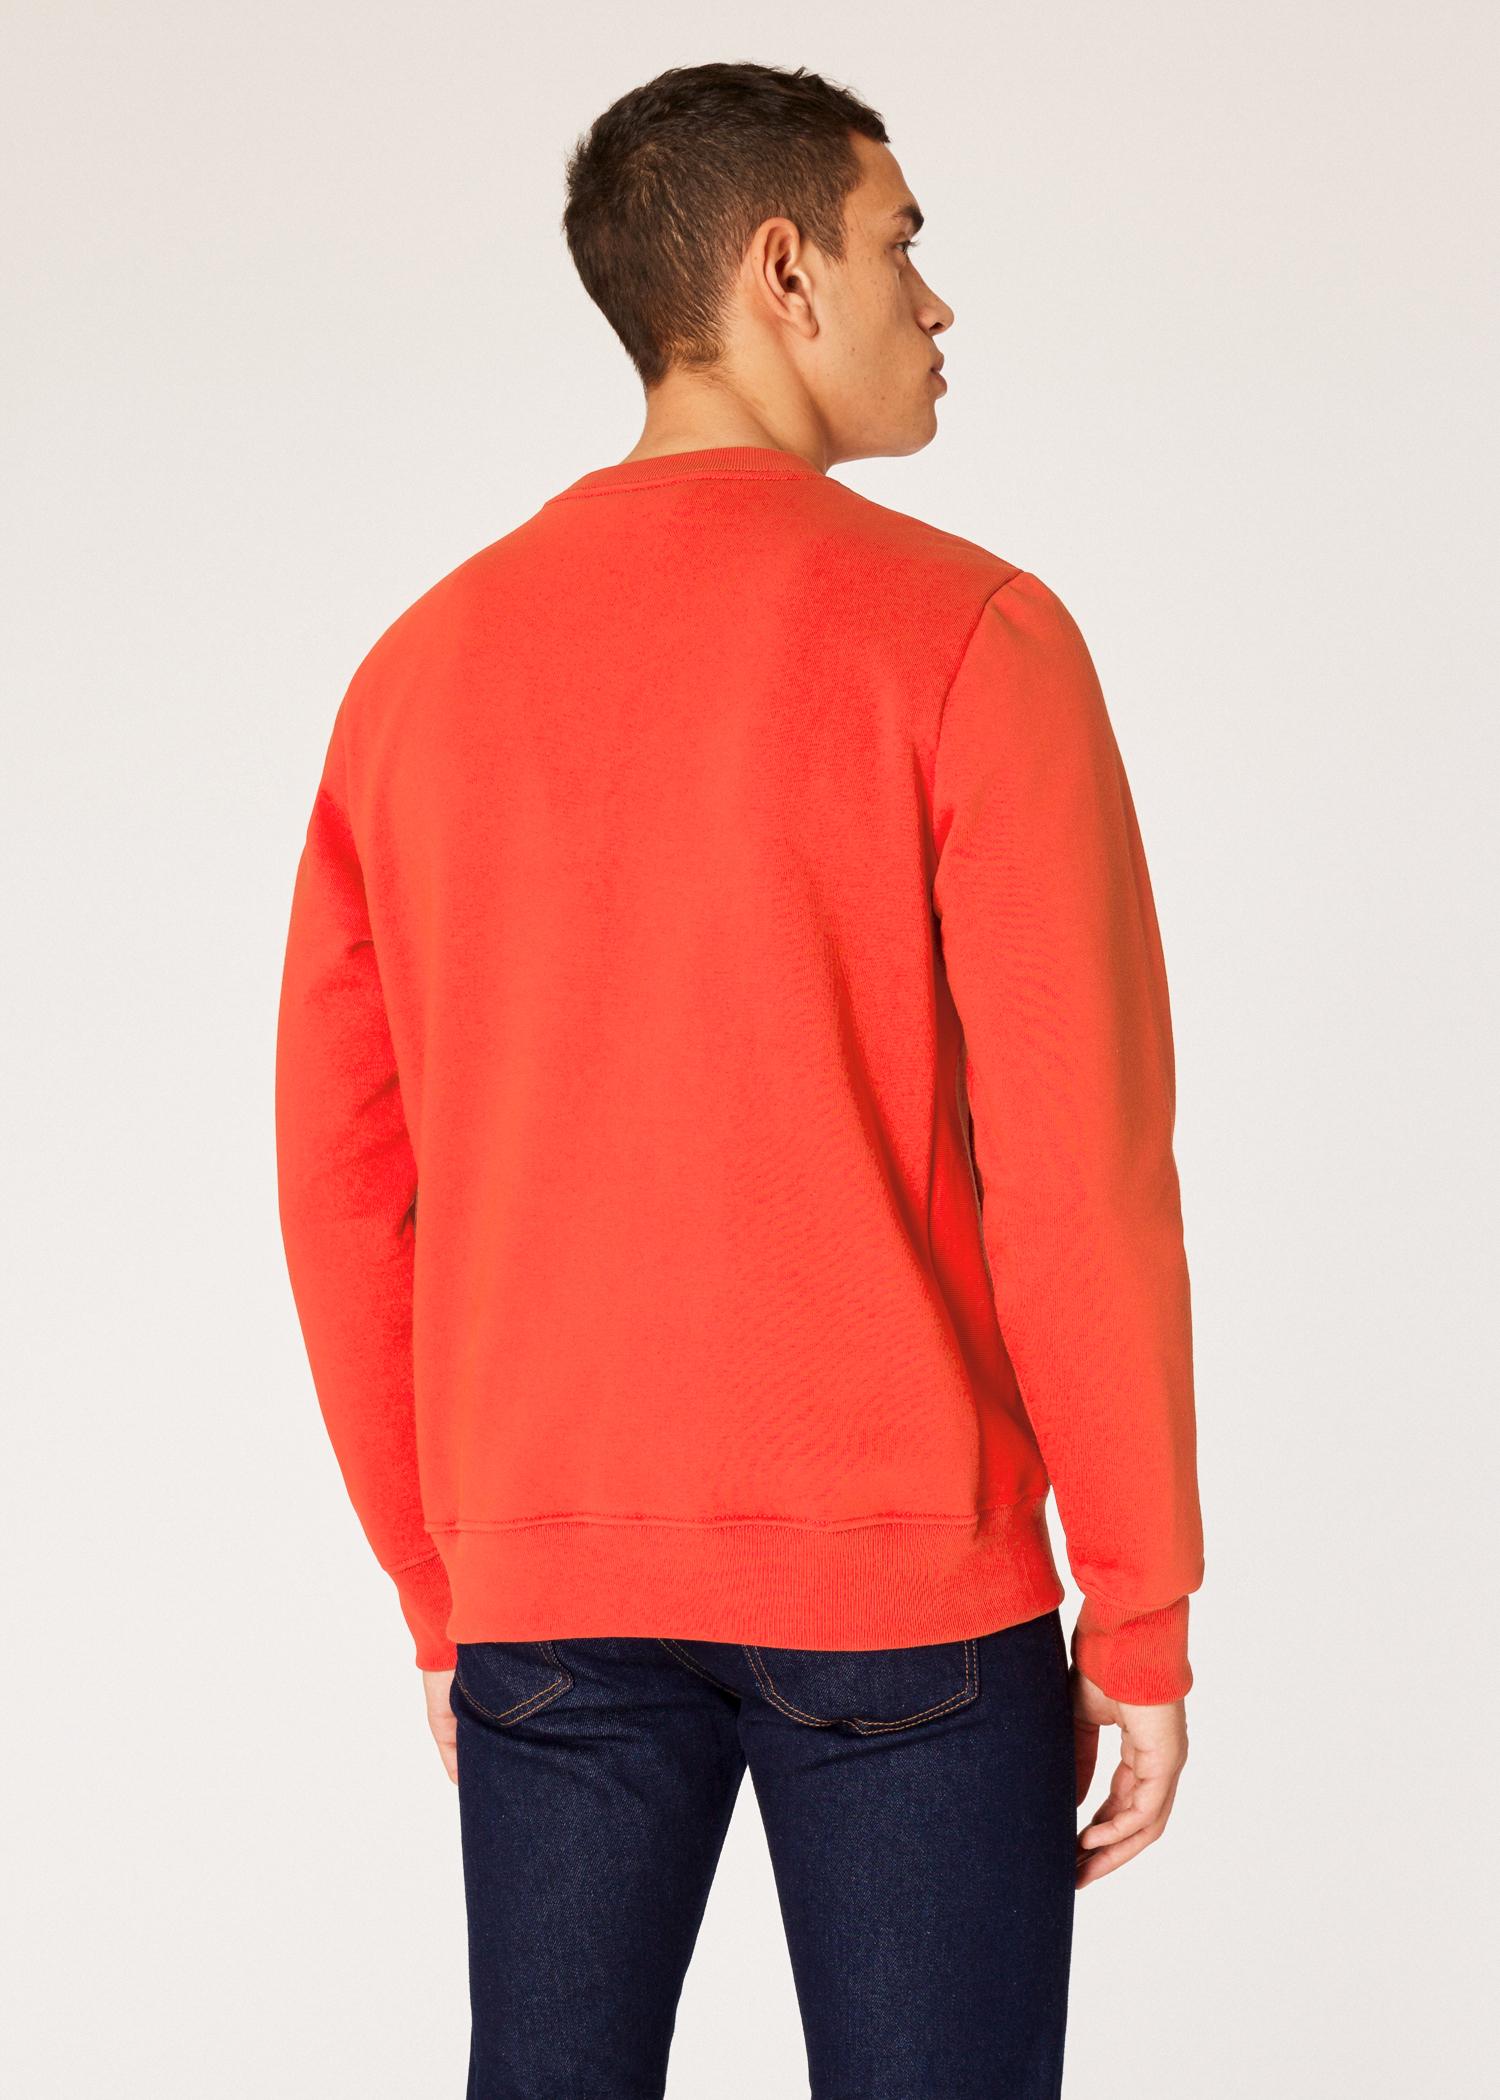 21805a6c001 Vue mannequin dos zoom - Sweatshirt Homme Orange Logo Zèbre En Coton Bio  Paul Smith